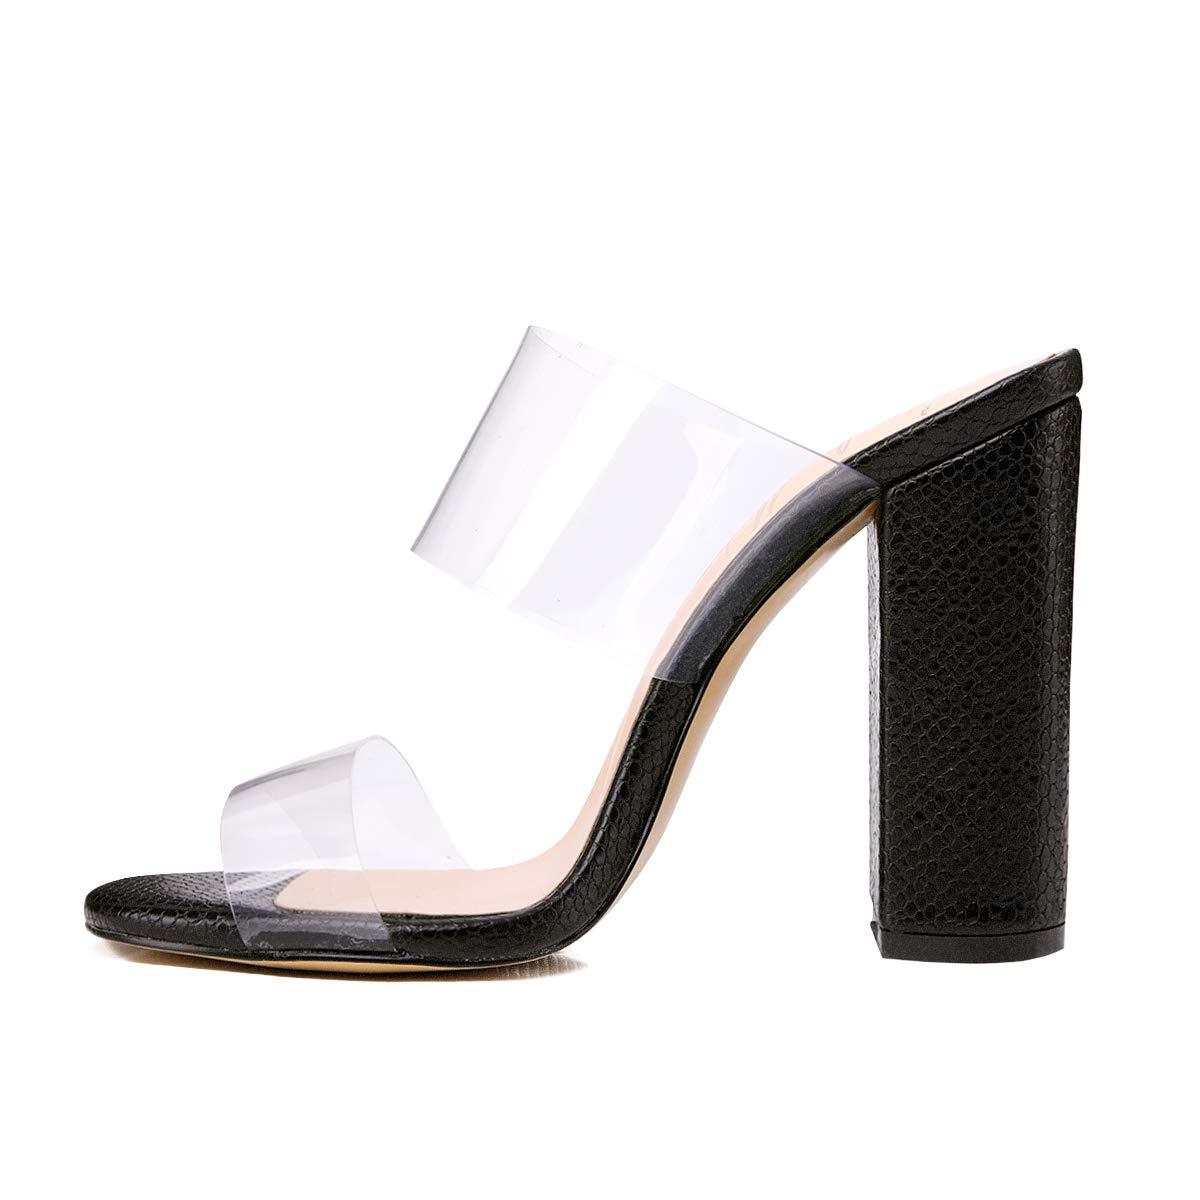 4860b99e9be Onlymaker Women's Clear Open Toe Double Straps Chunky Heels Mules ...